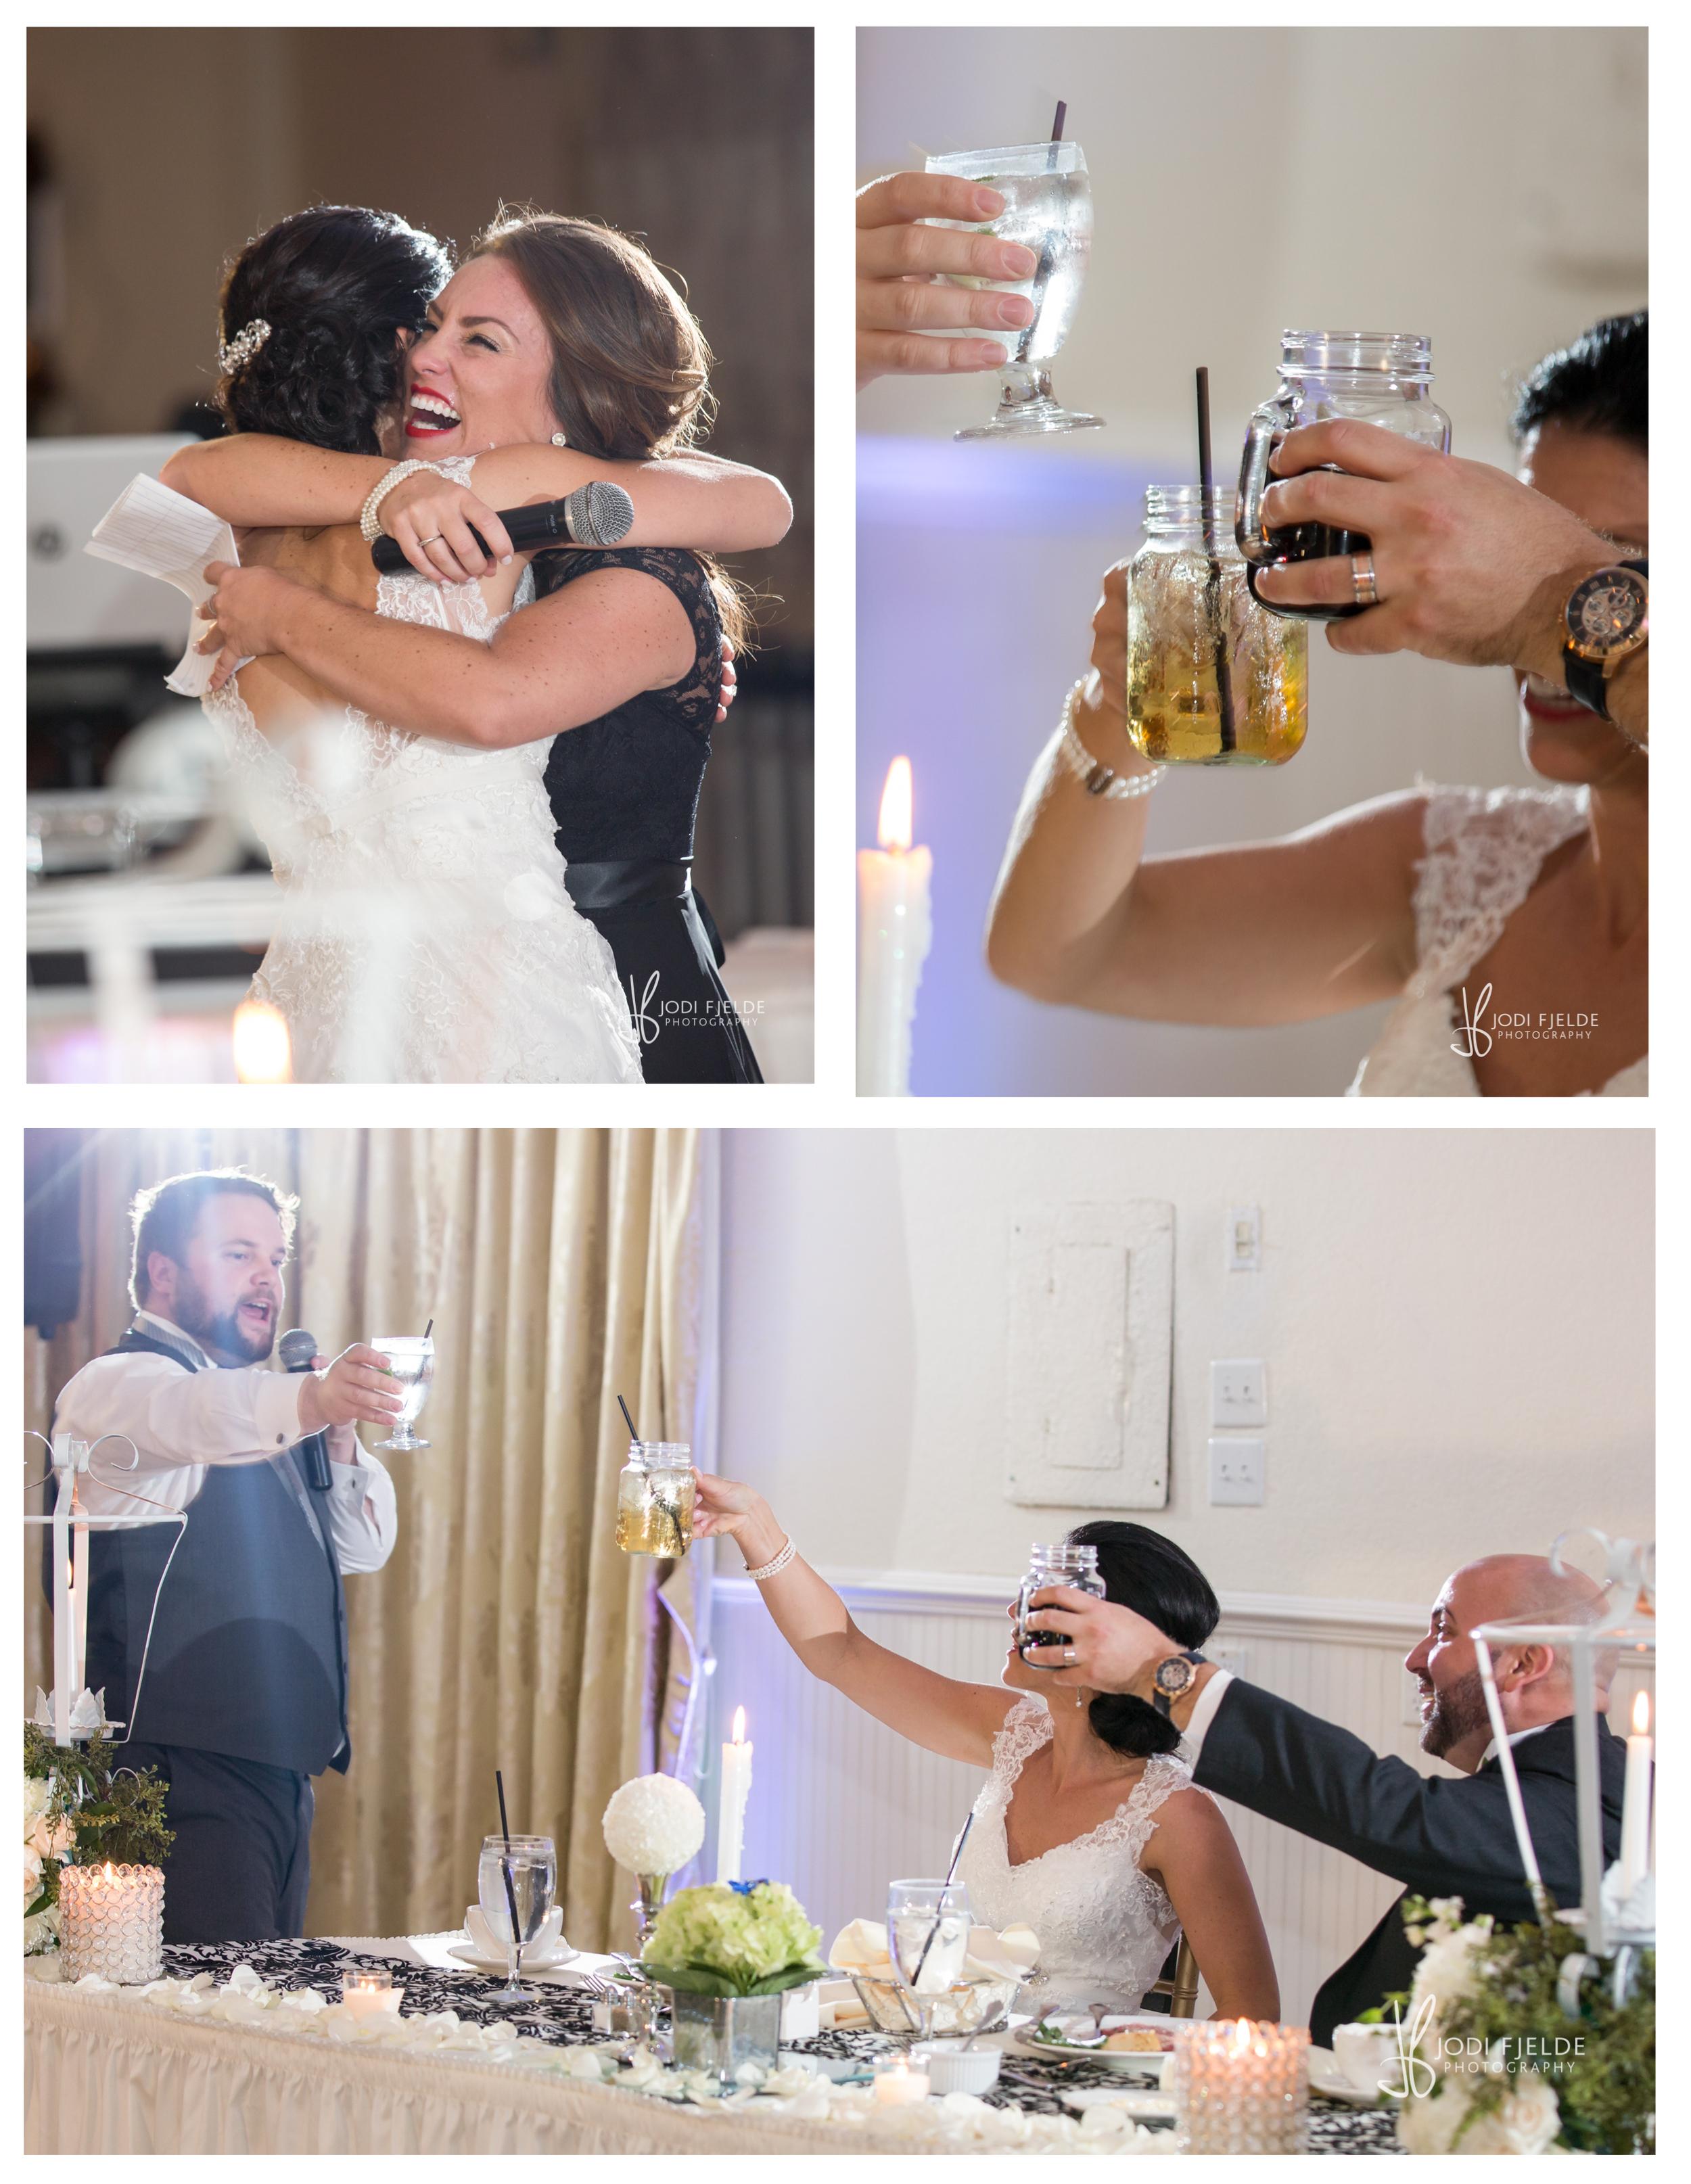 Highland_Manor_Apopka_Florida_wedding_Jackie_&_Tim_photography_jodi_Fjelde_photography-31.jpg